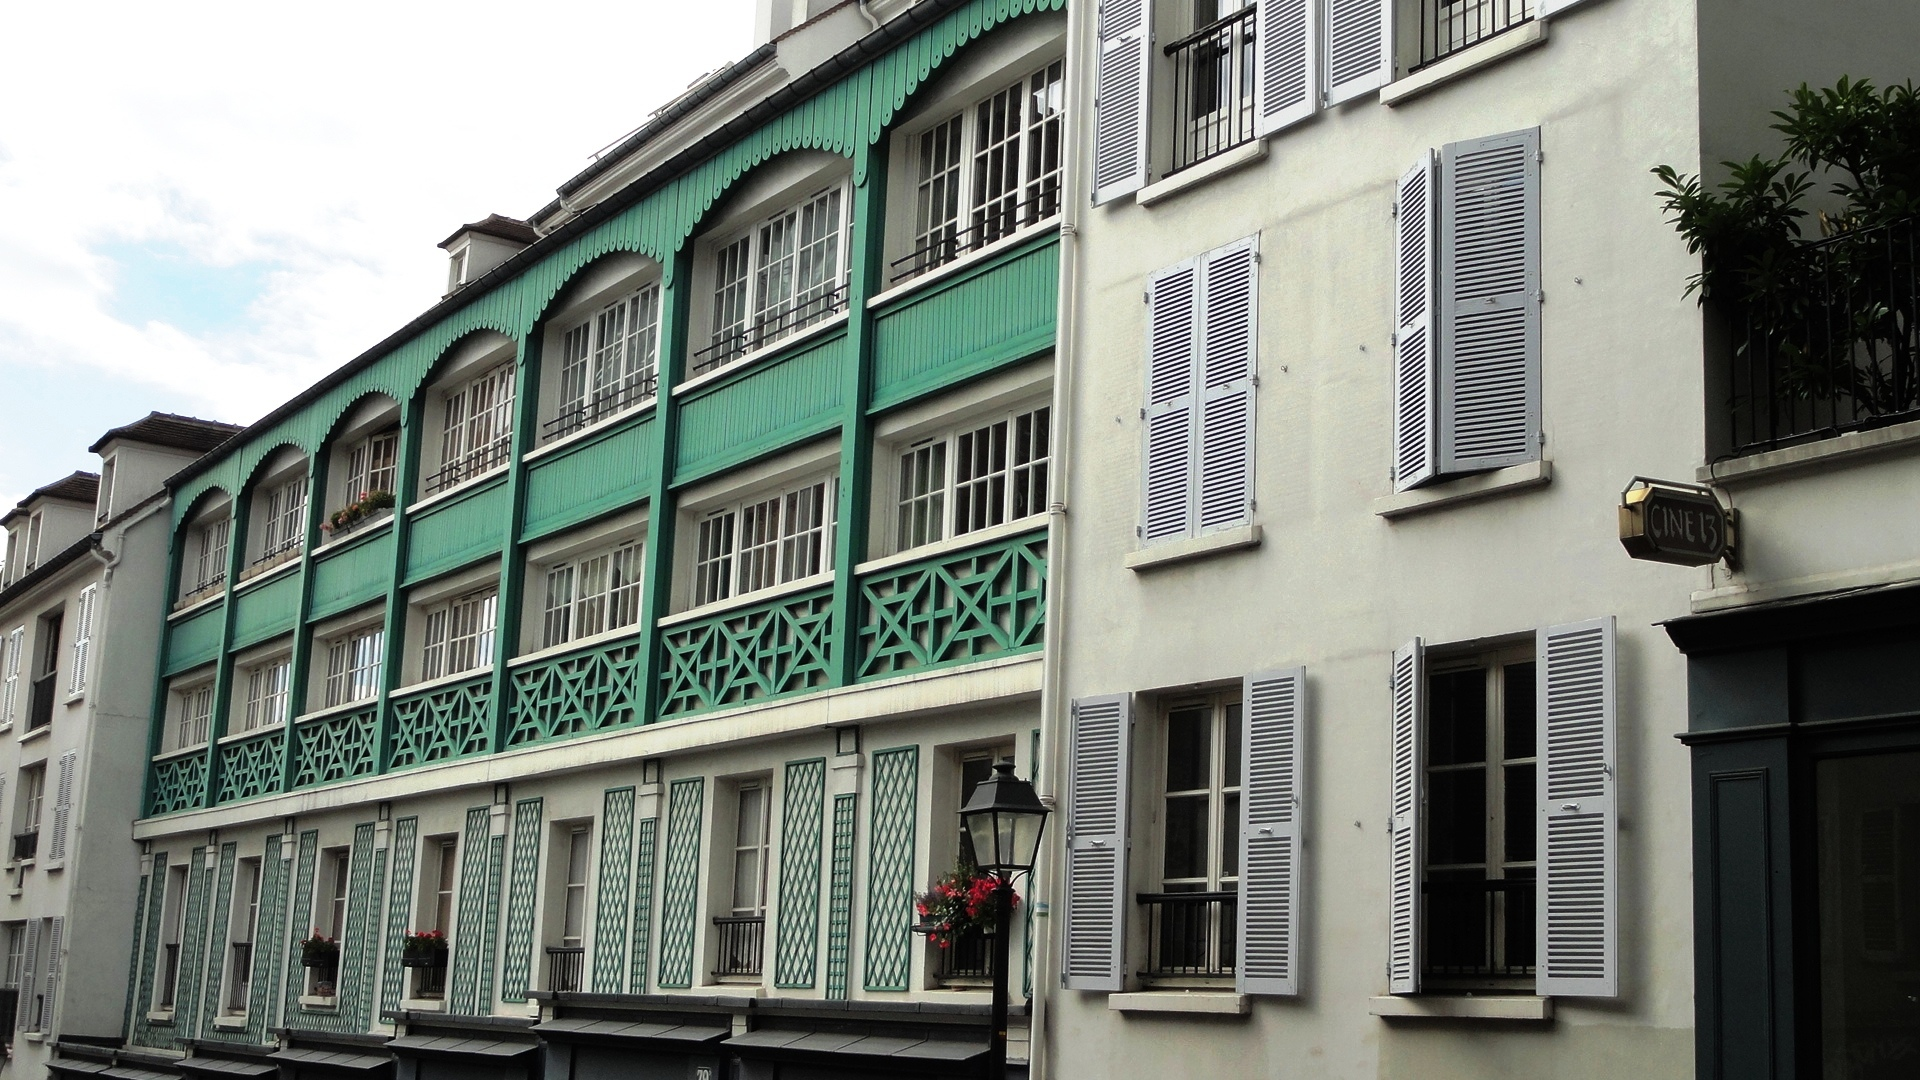 Promenade dans Montmartre - Rue Lepic